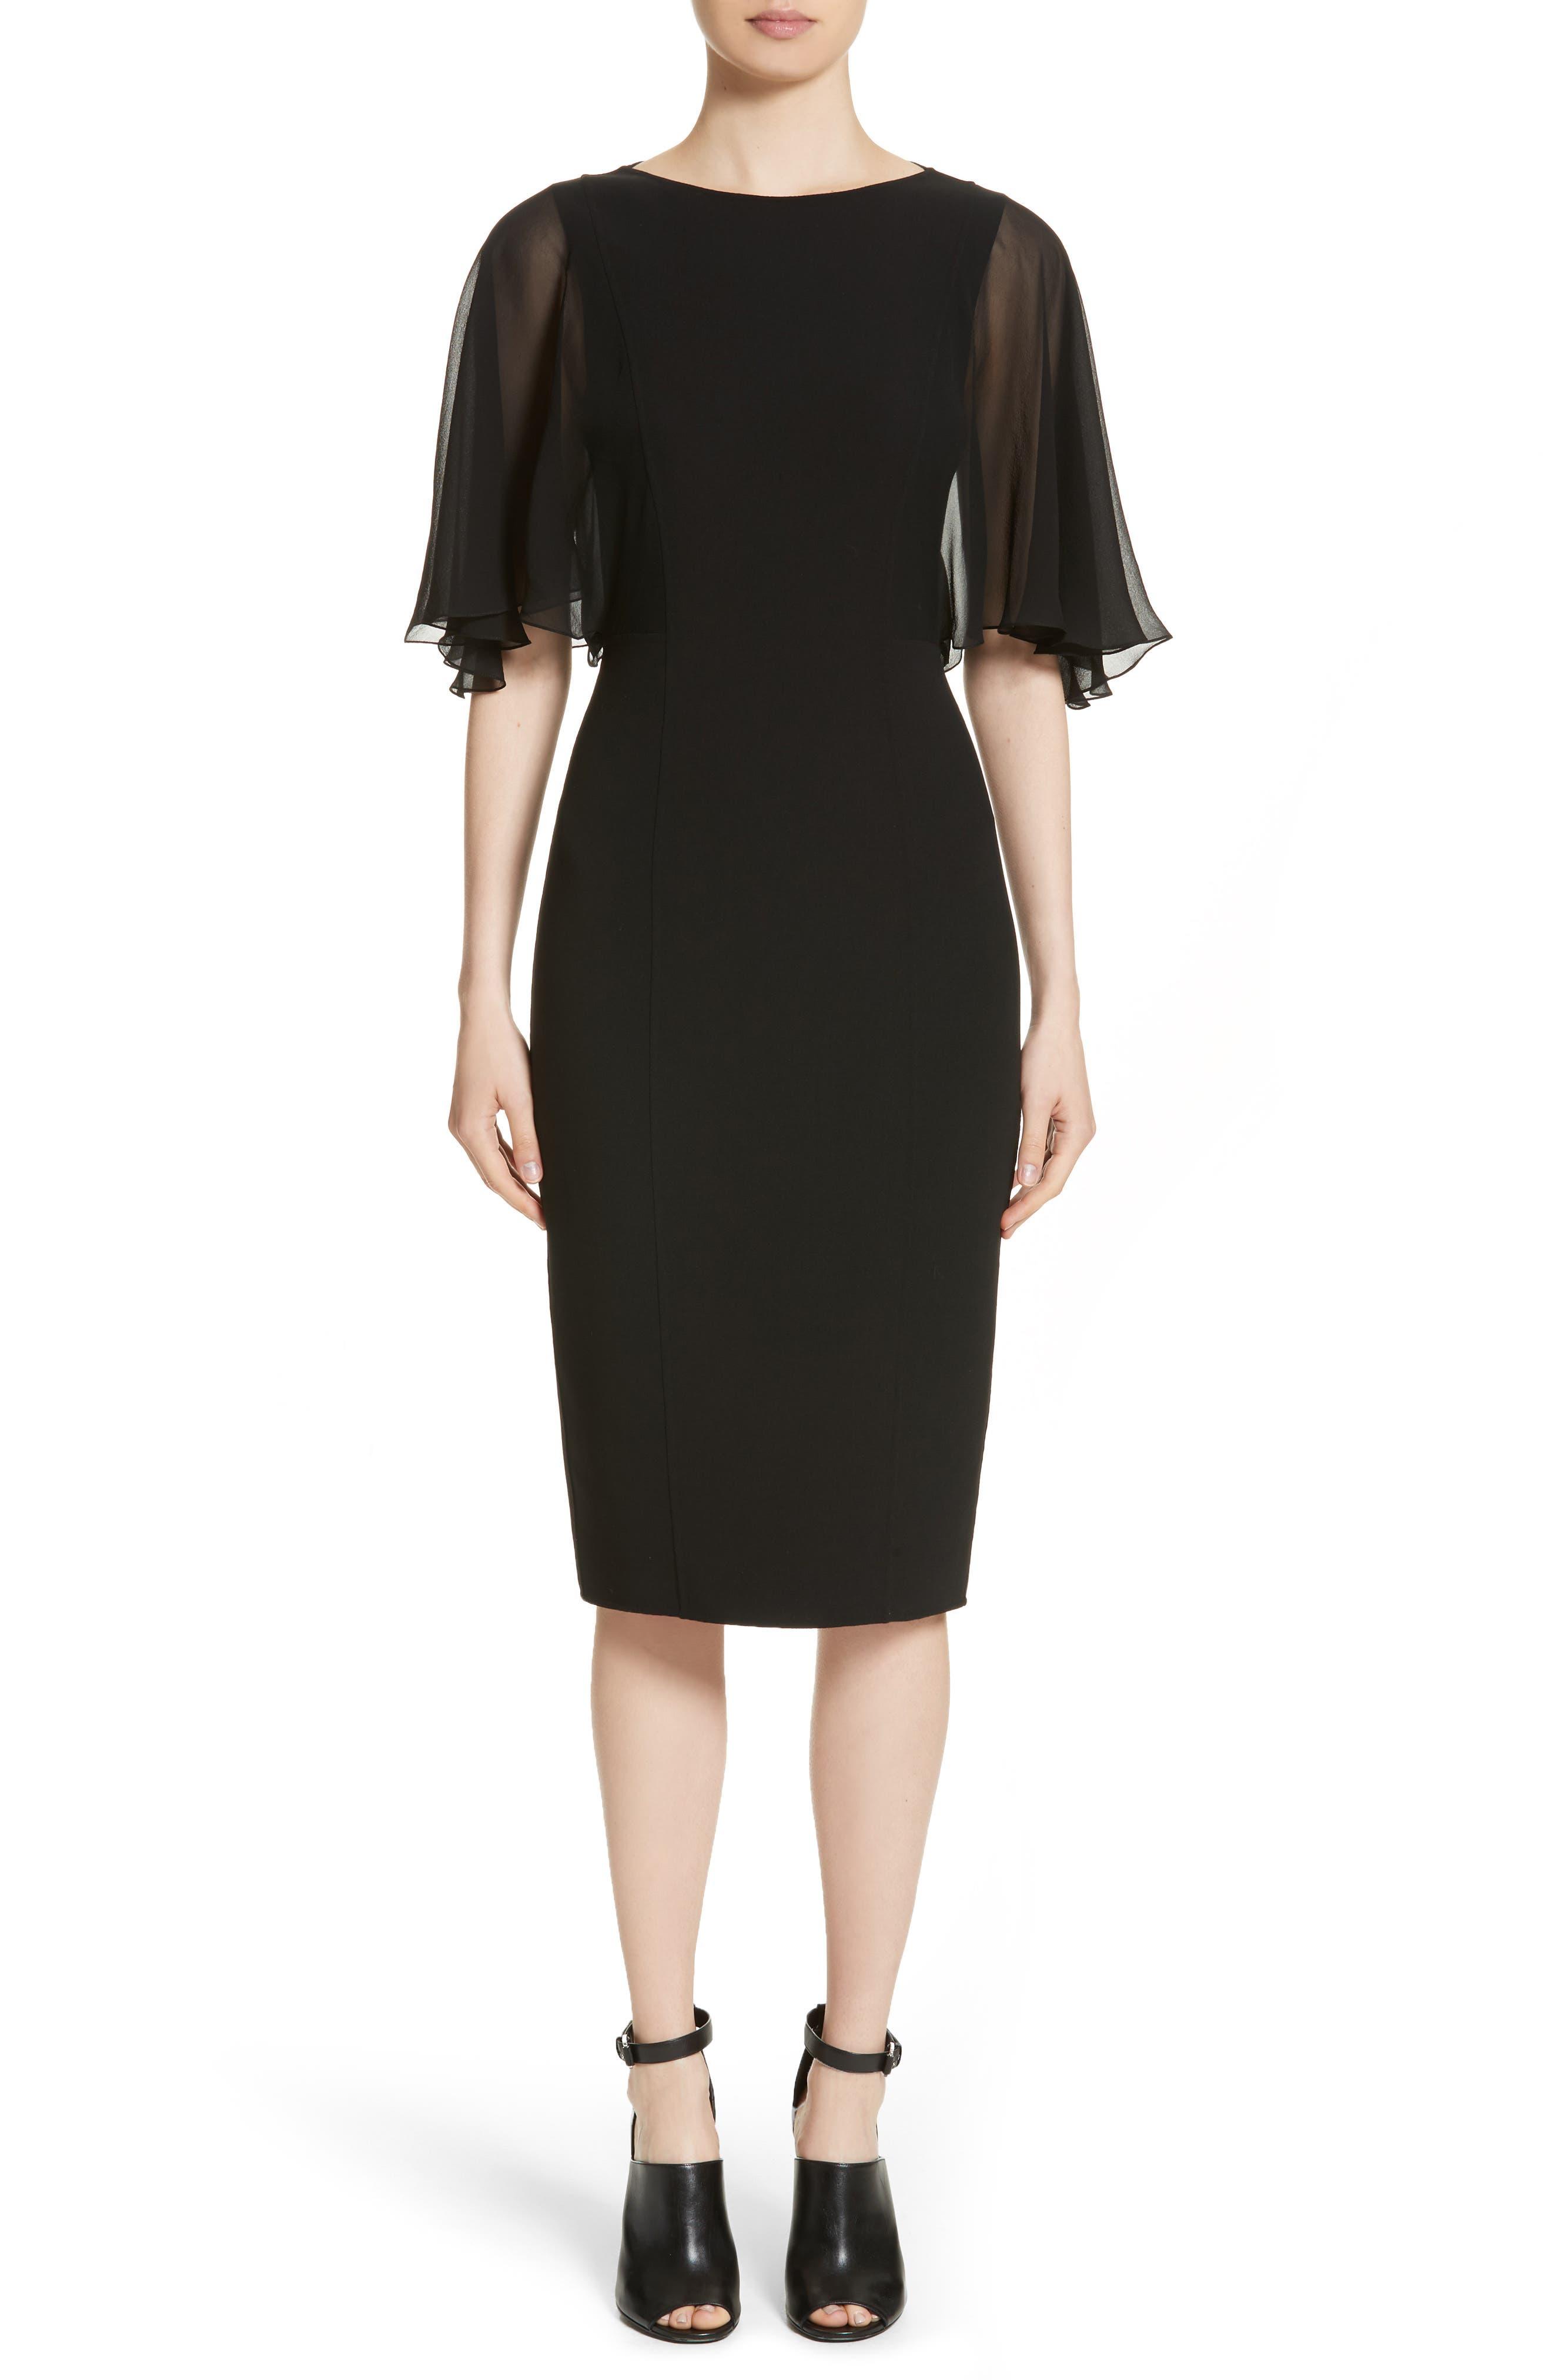 Alternate Image 1 Selected - Michael Kors Draped Chiffon Sleeve Dress